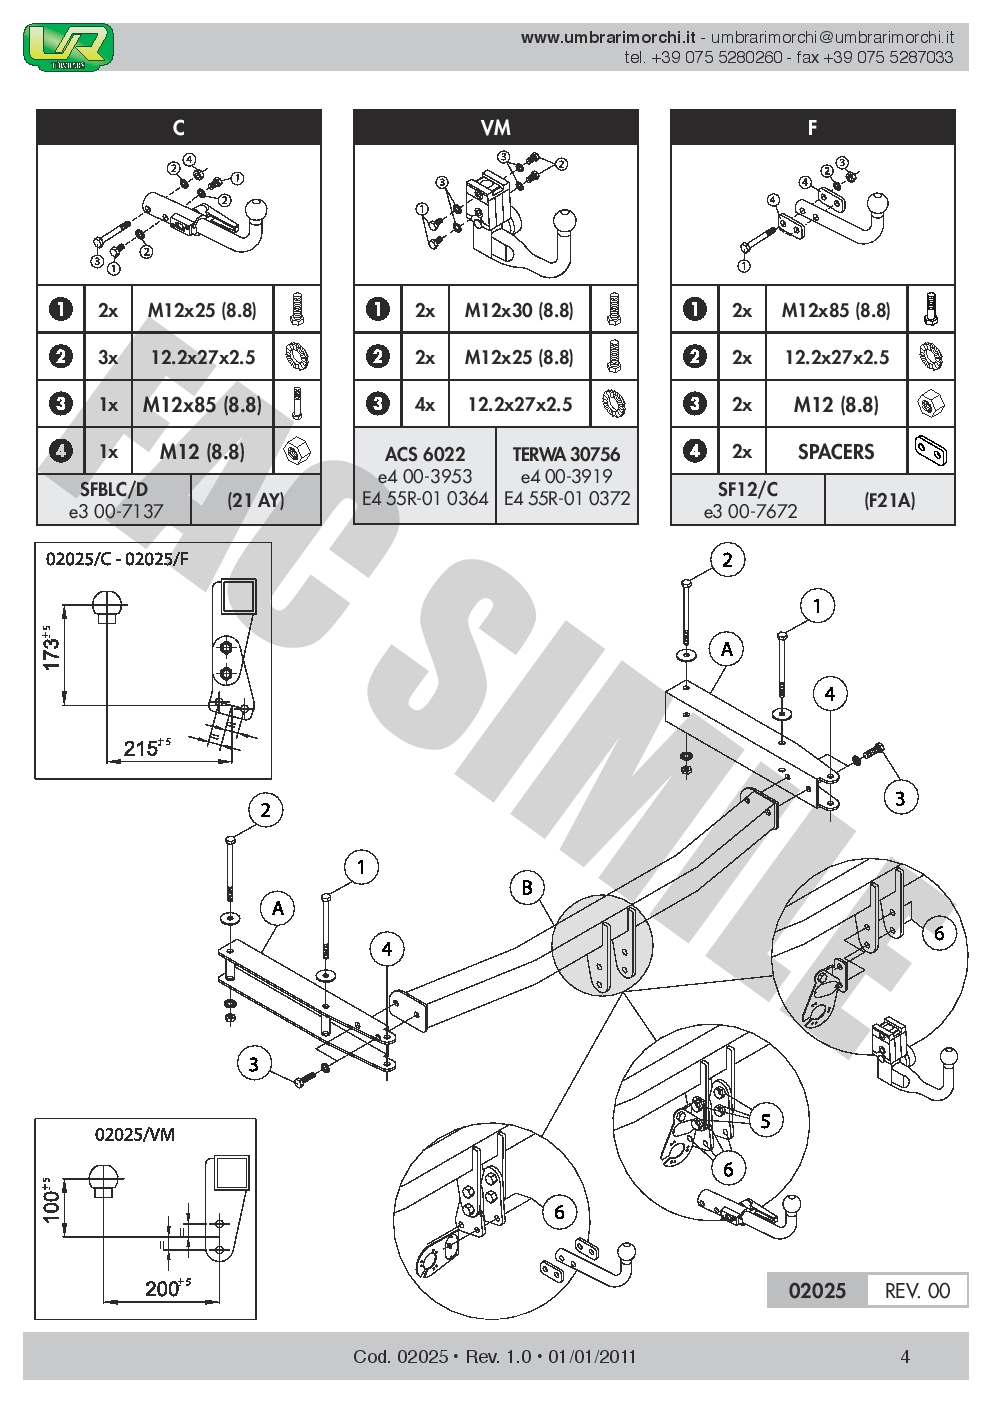 AHK Abnehmbare Anhängerkupplung 7p C2 E-Satz Audi A6-S6 Quattro 08-11 02025//C/_B2